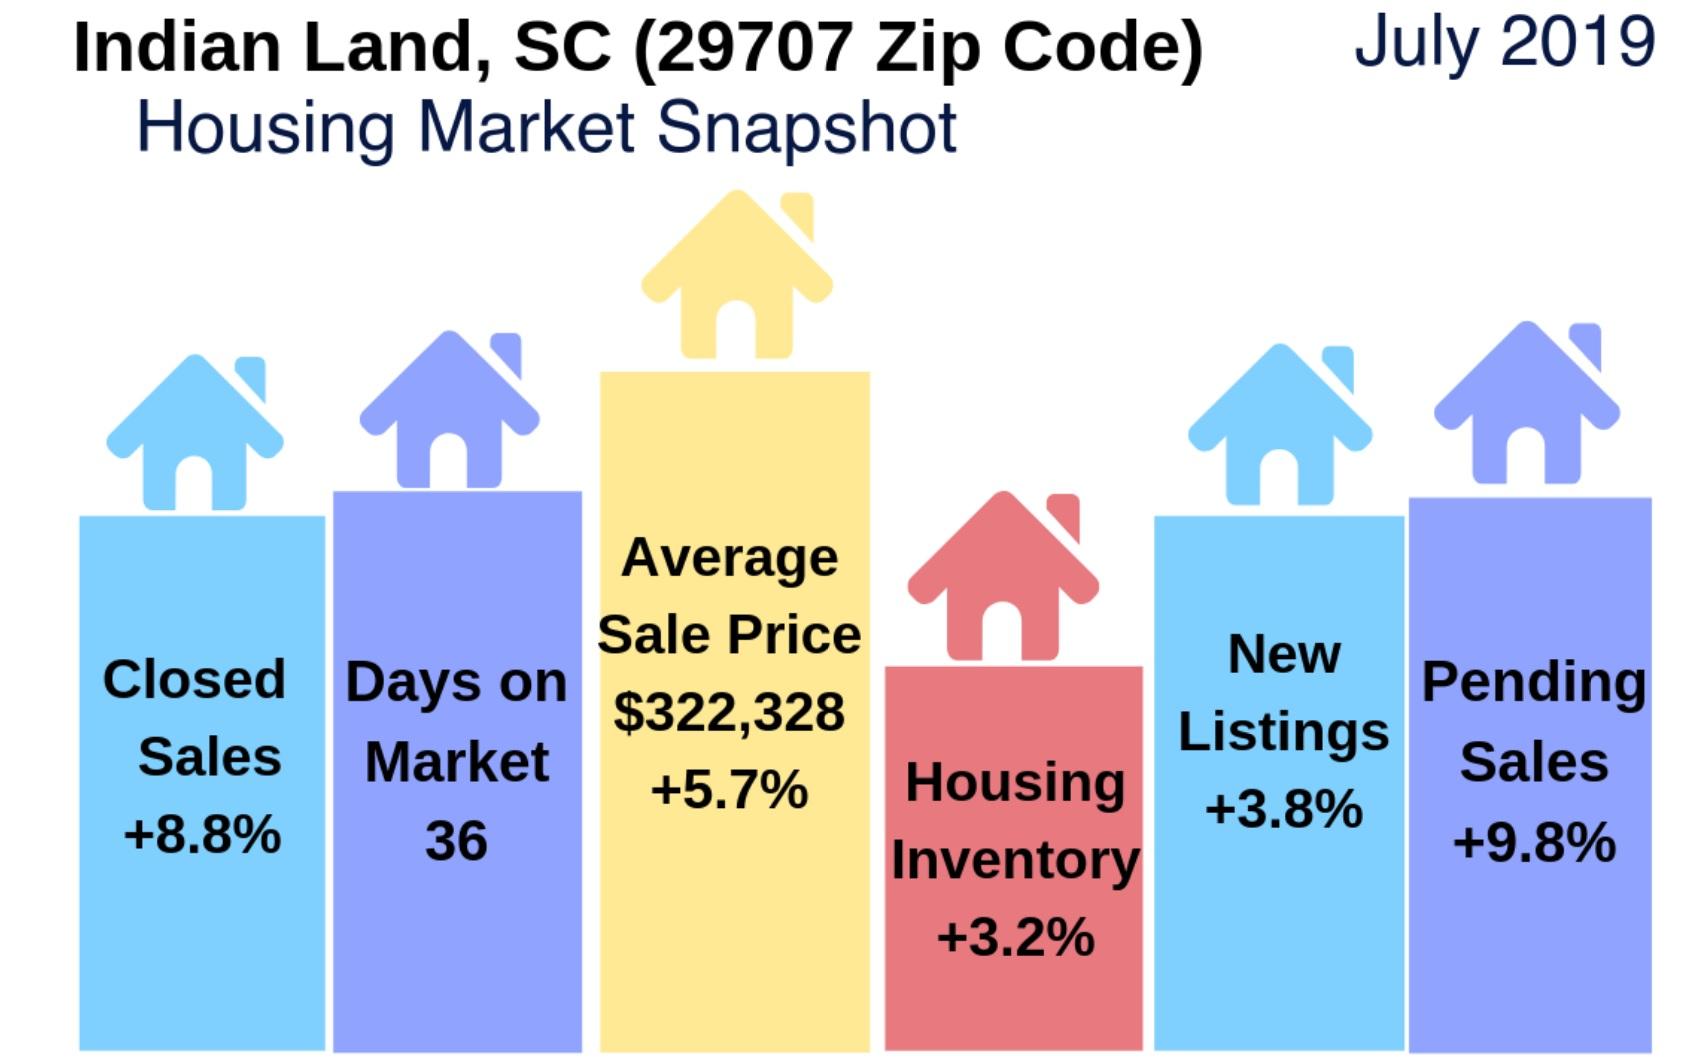 Indian Land, SC (29707) Real Estate Report: July 2019